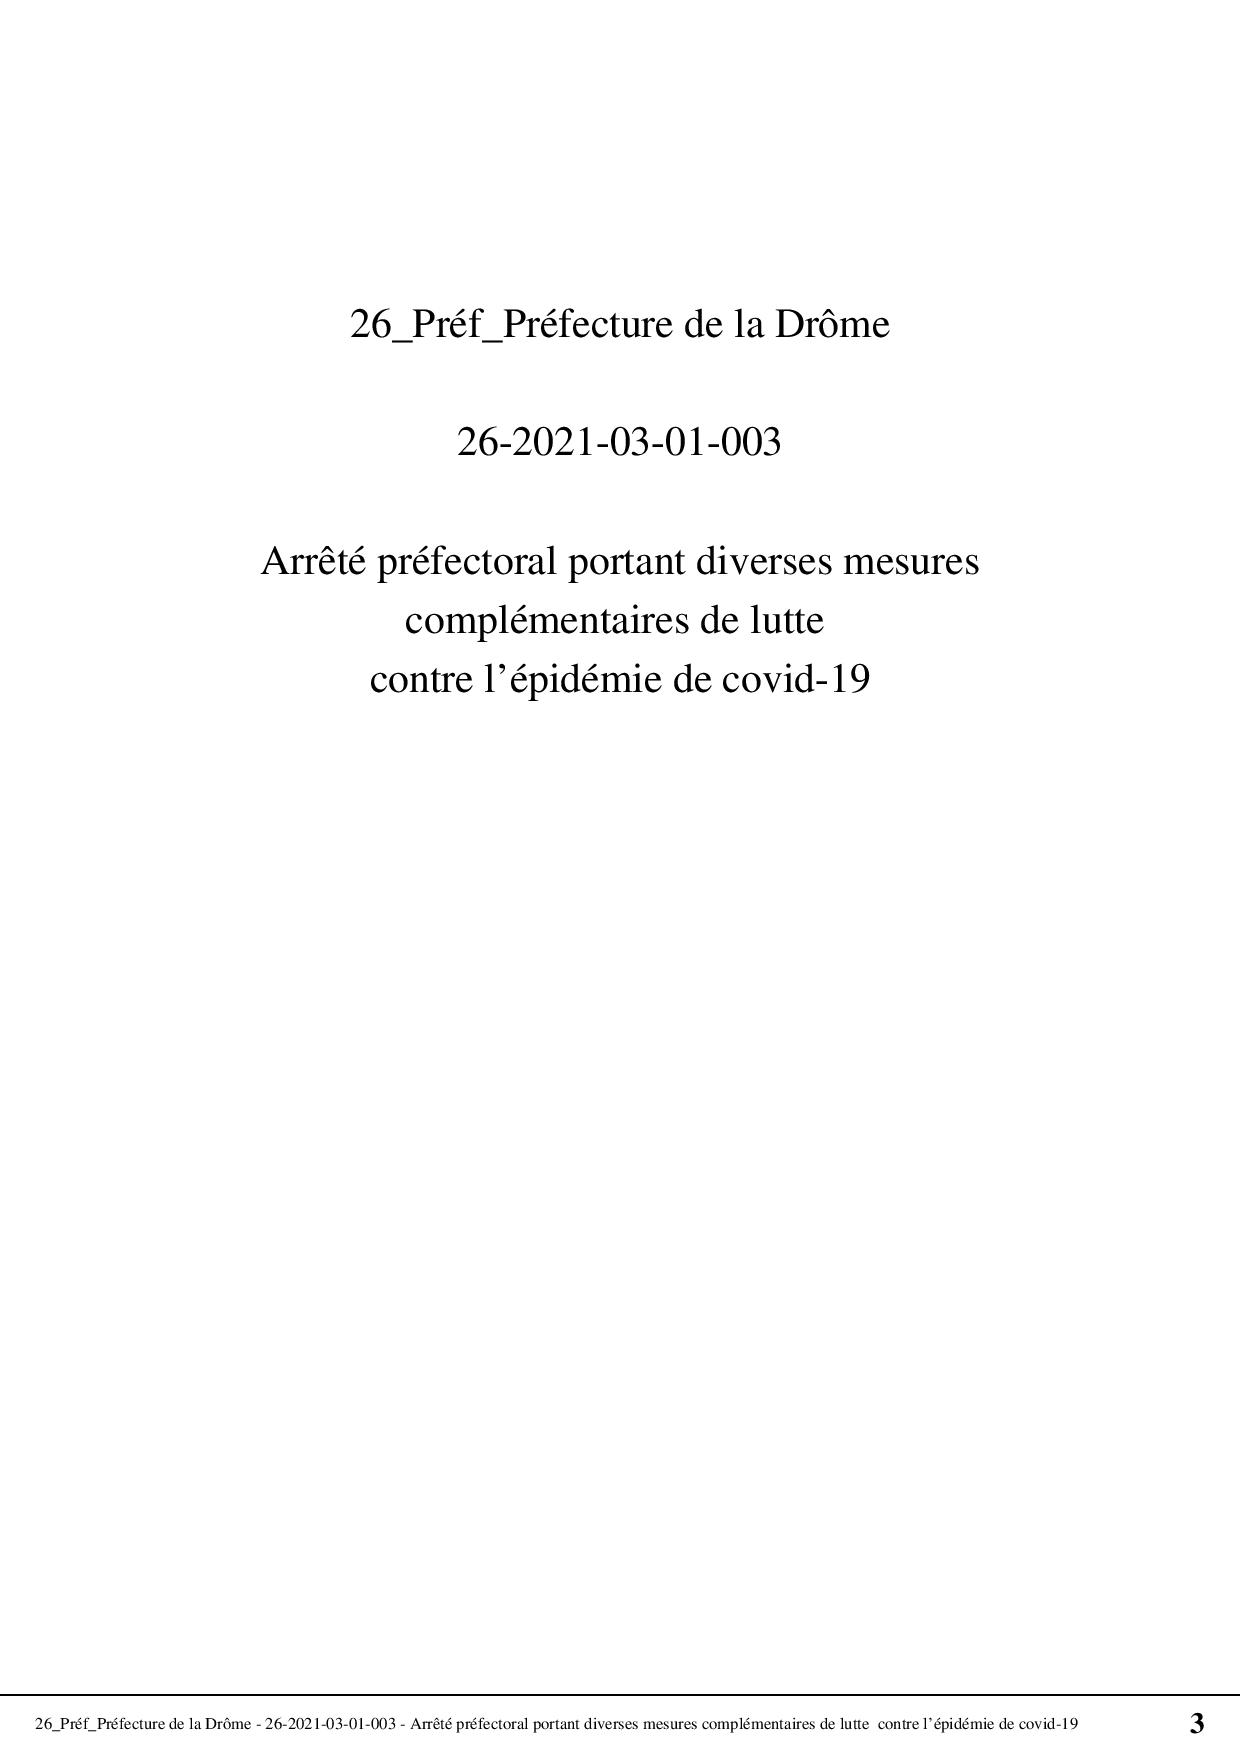 recueil-26-2021-043-recueil-des-actes-administratifs-special_1_-2-page-003.jpg